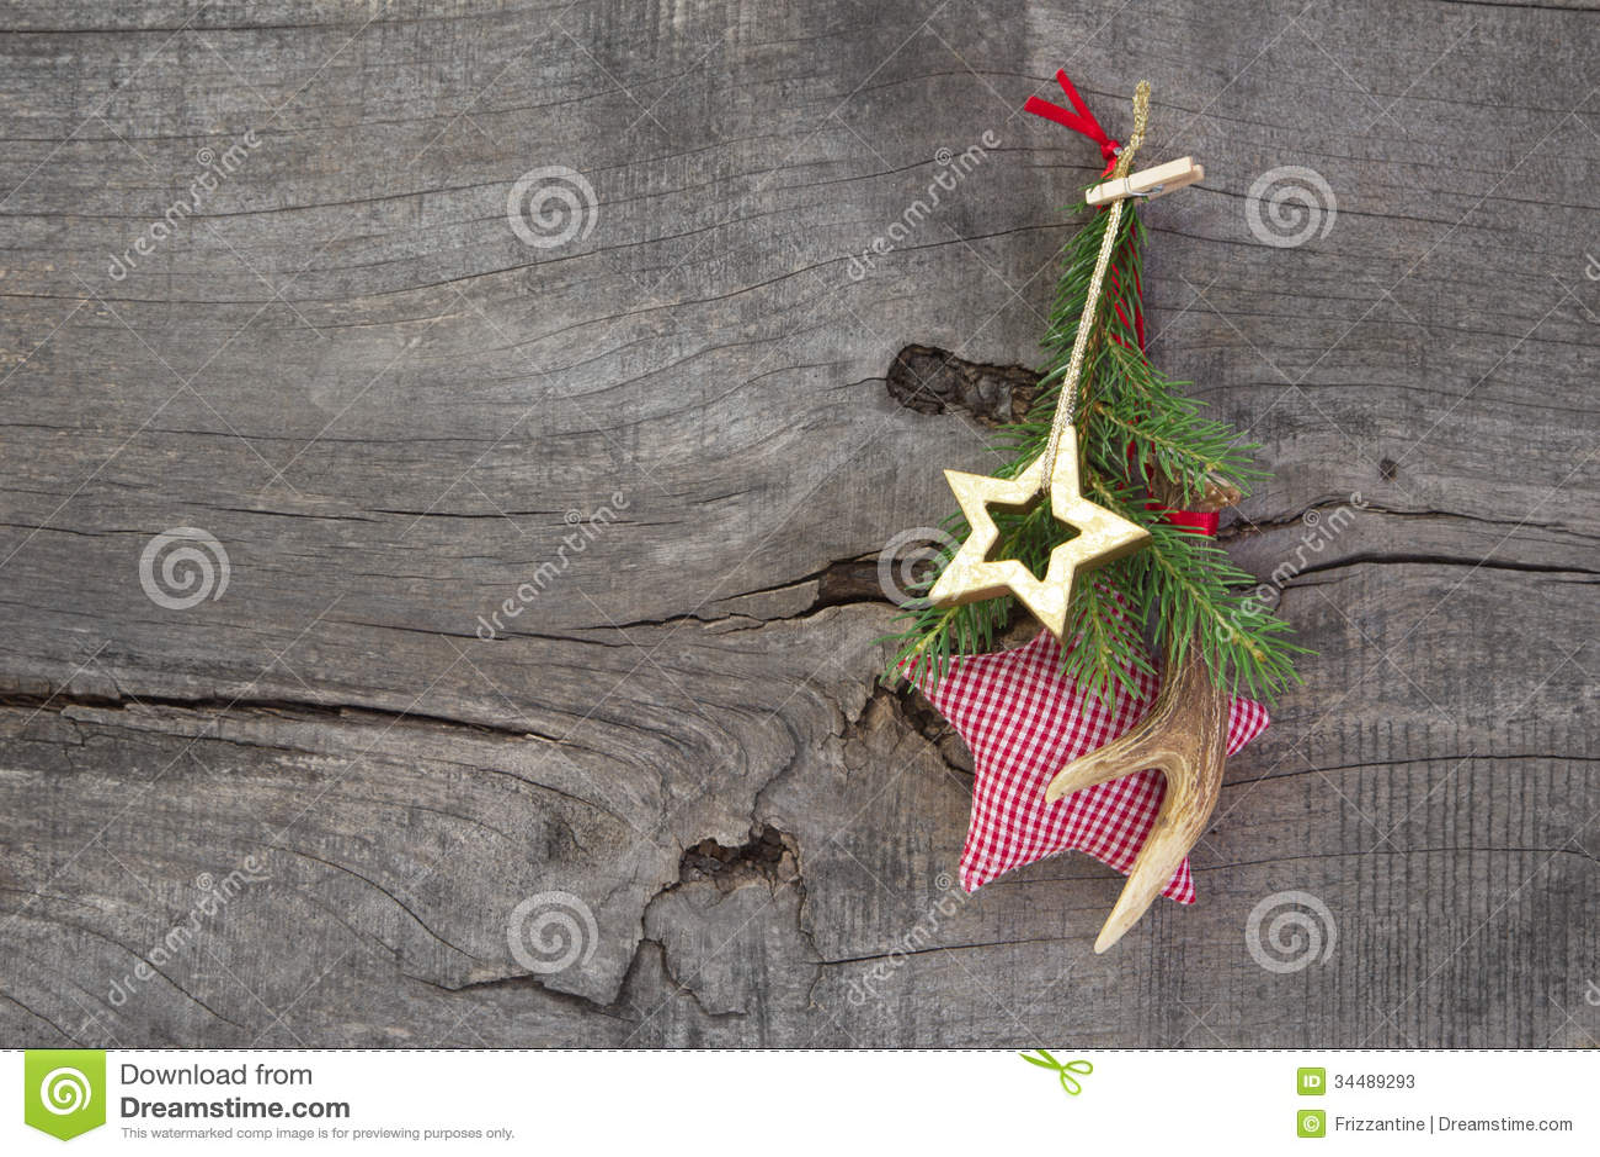 #96354F Décoration Naturelle De Noël Avec L'andouiller Et L'étoile  6453 décoration noel naturelle 1300x957 px @ aertt.com